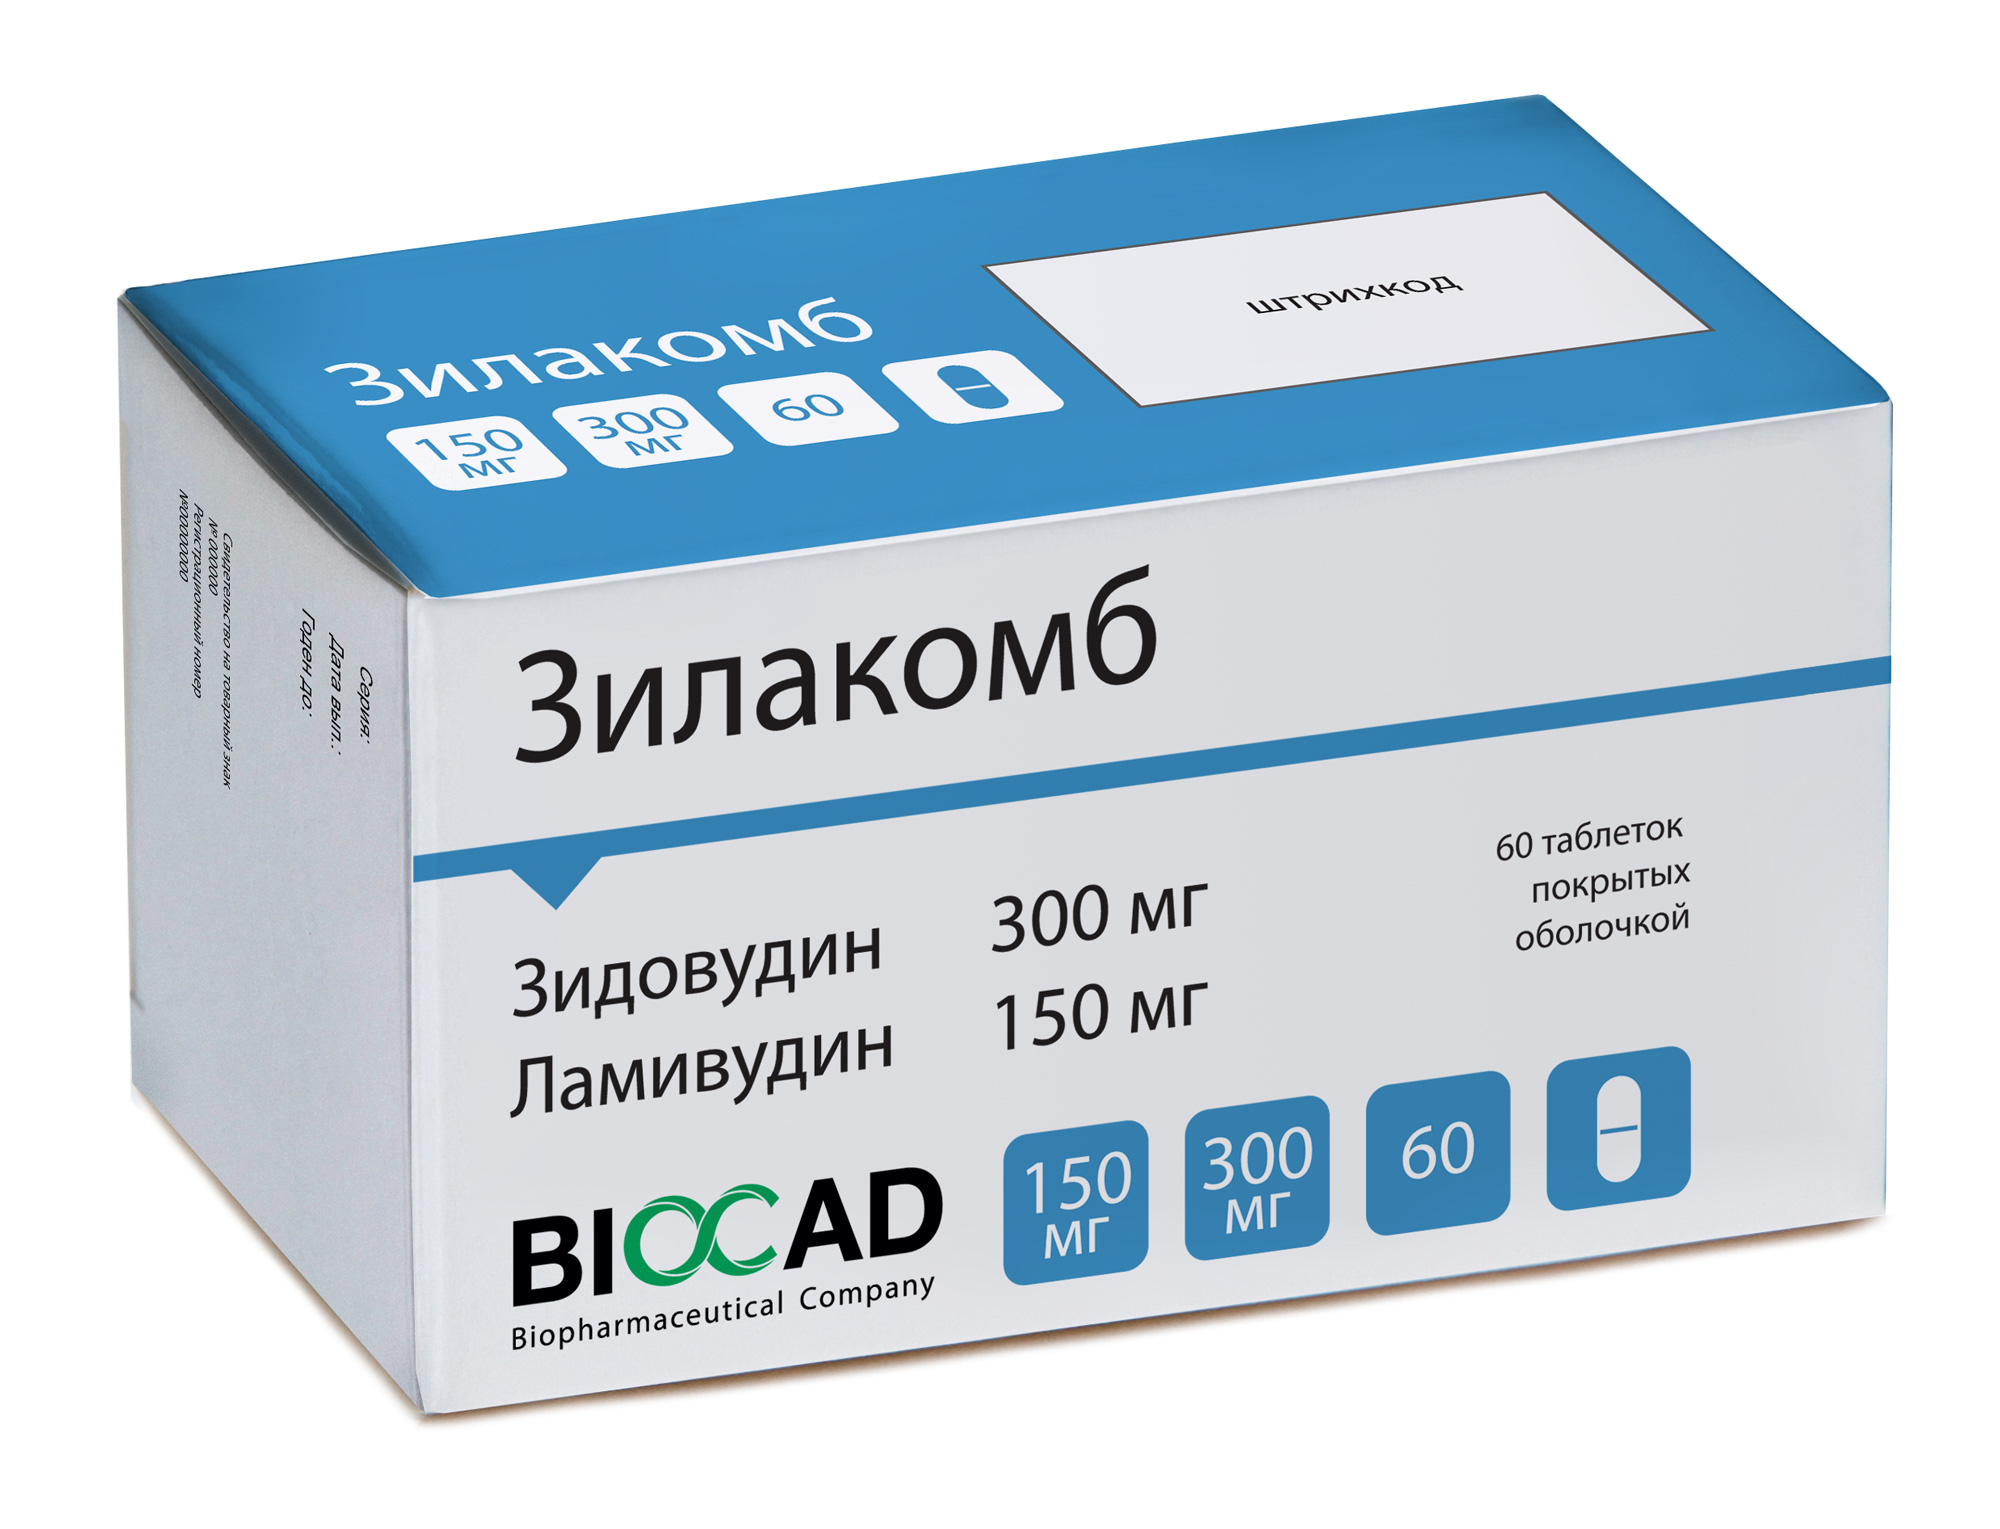 Зилакомб® (ламивудин +зидовудин)